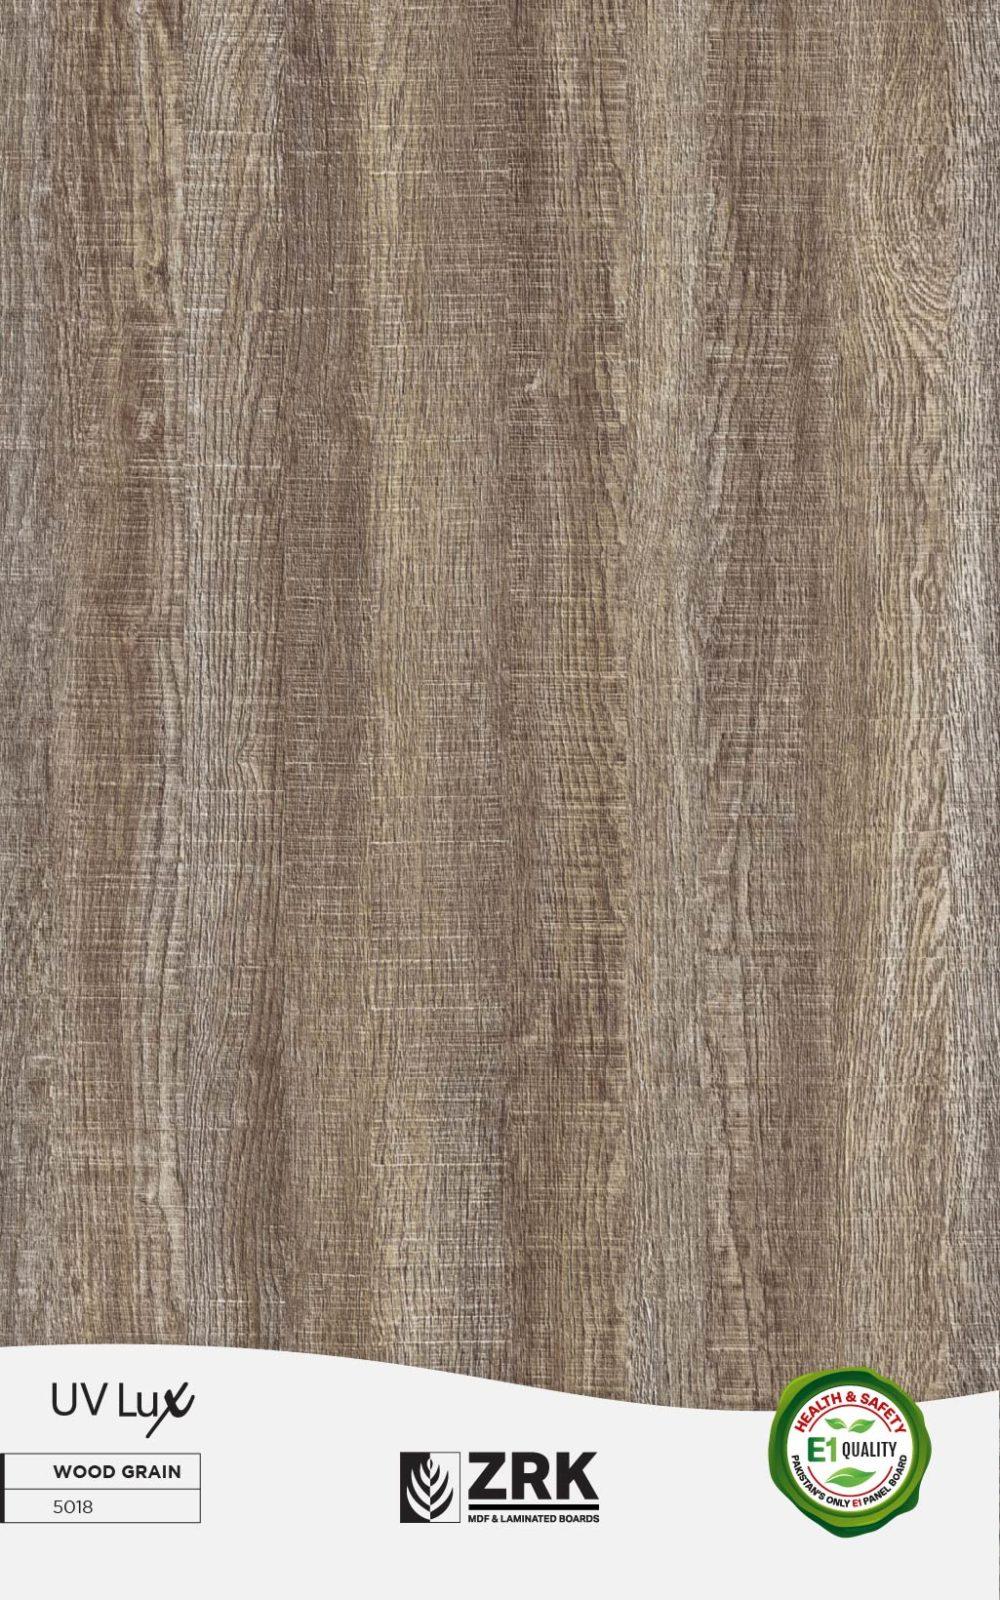 UV LUX - Wood Grain - 5018